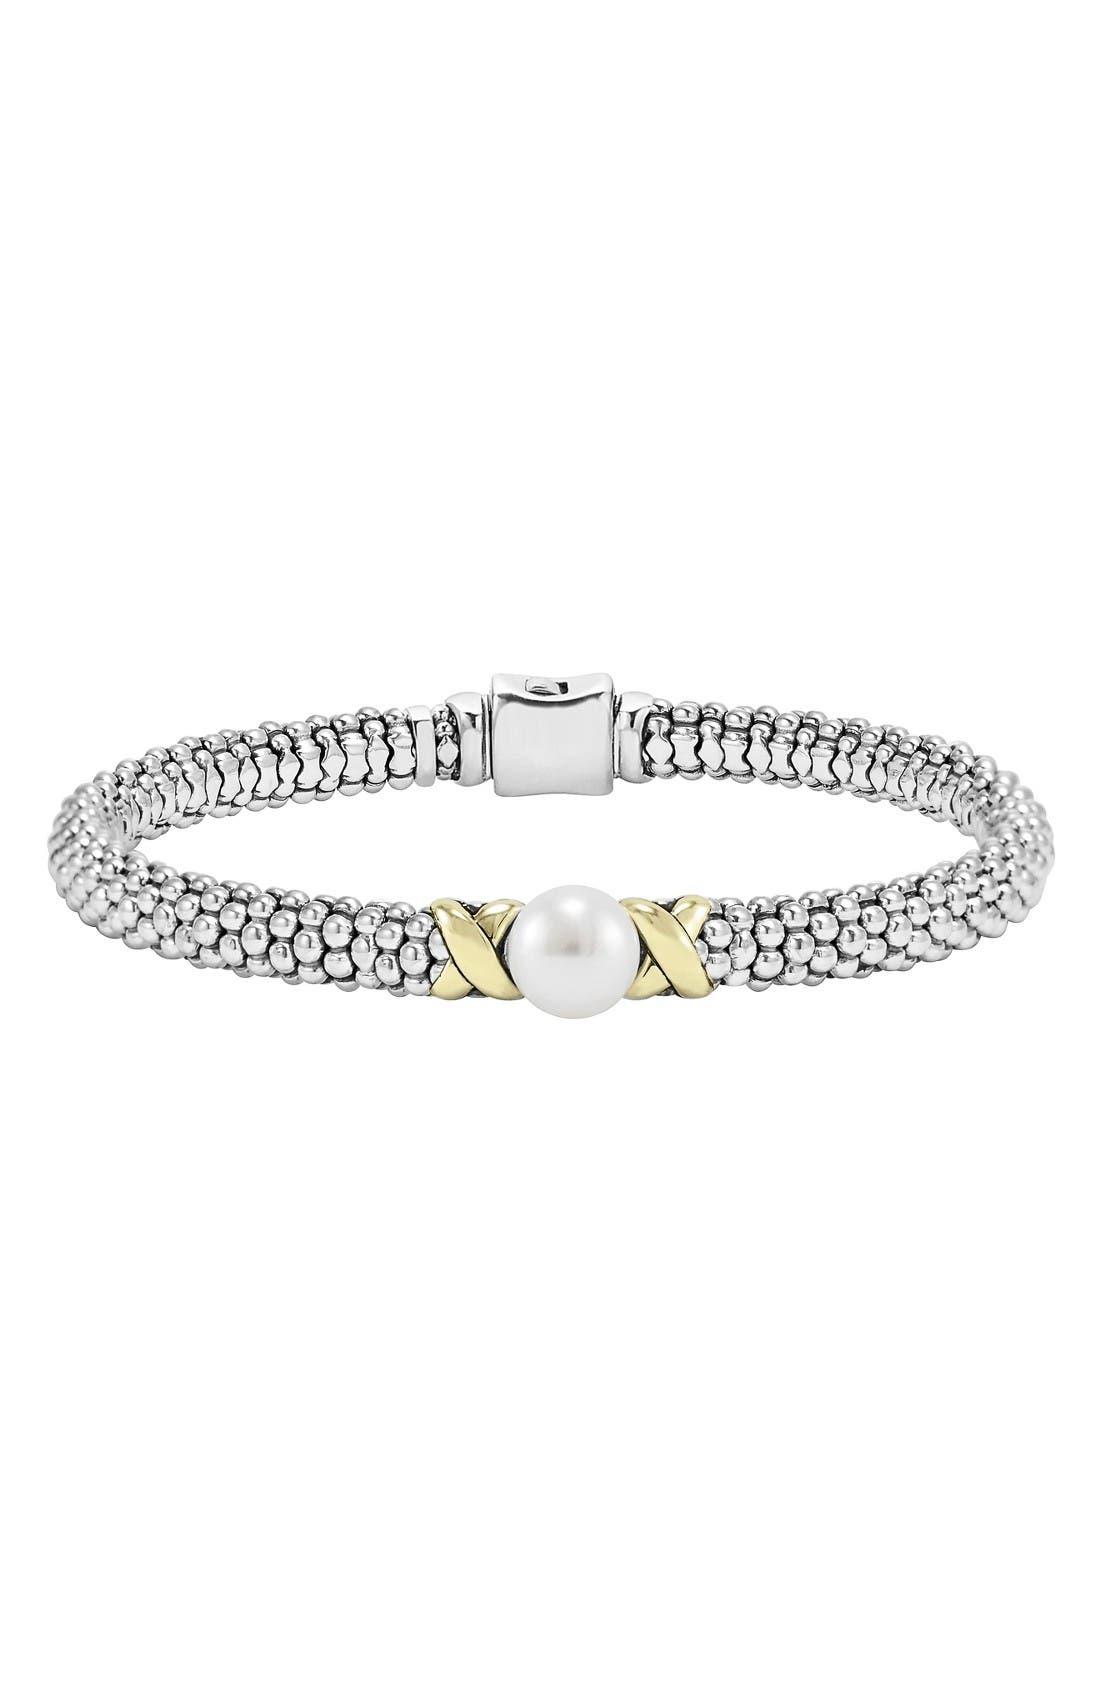 Alternate Image 1 Selected - LAGOS 'Luna' Pearl Rope Bracelet